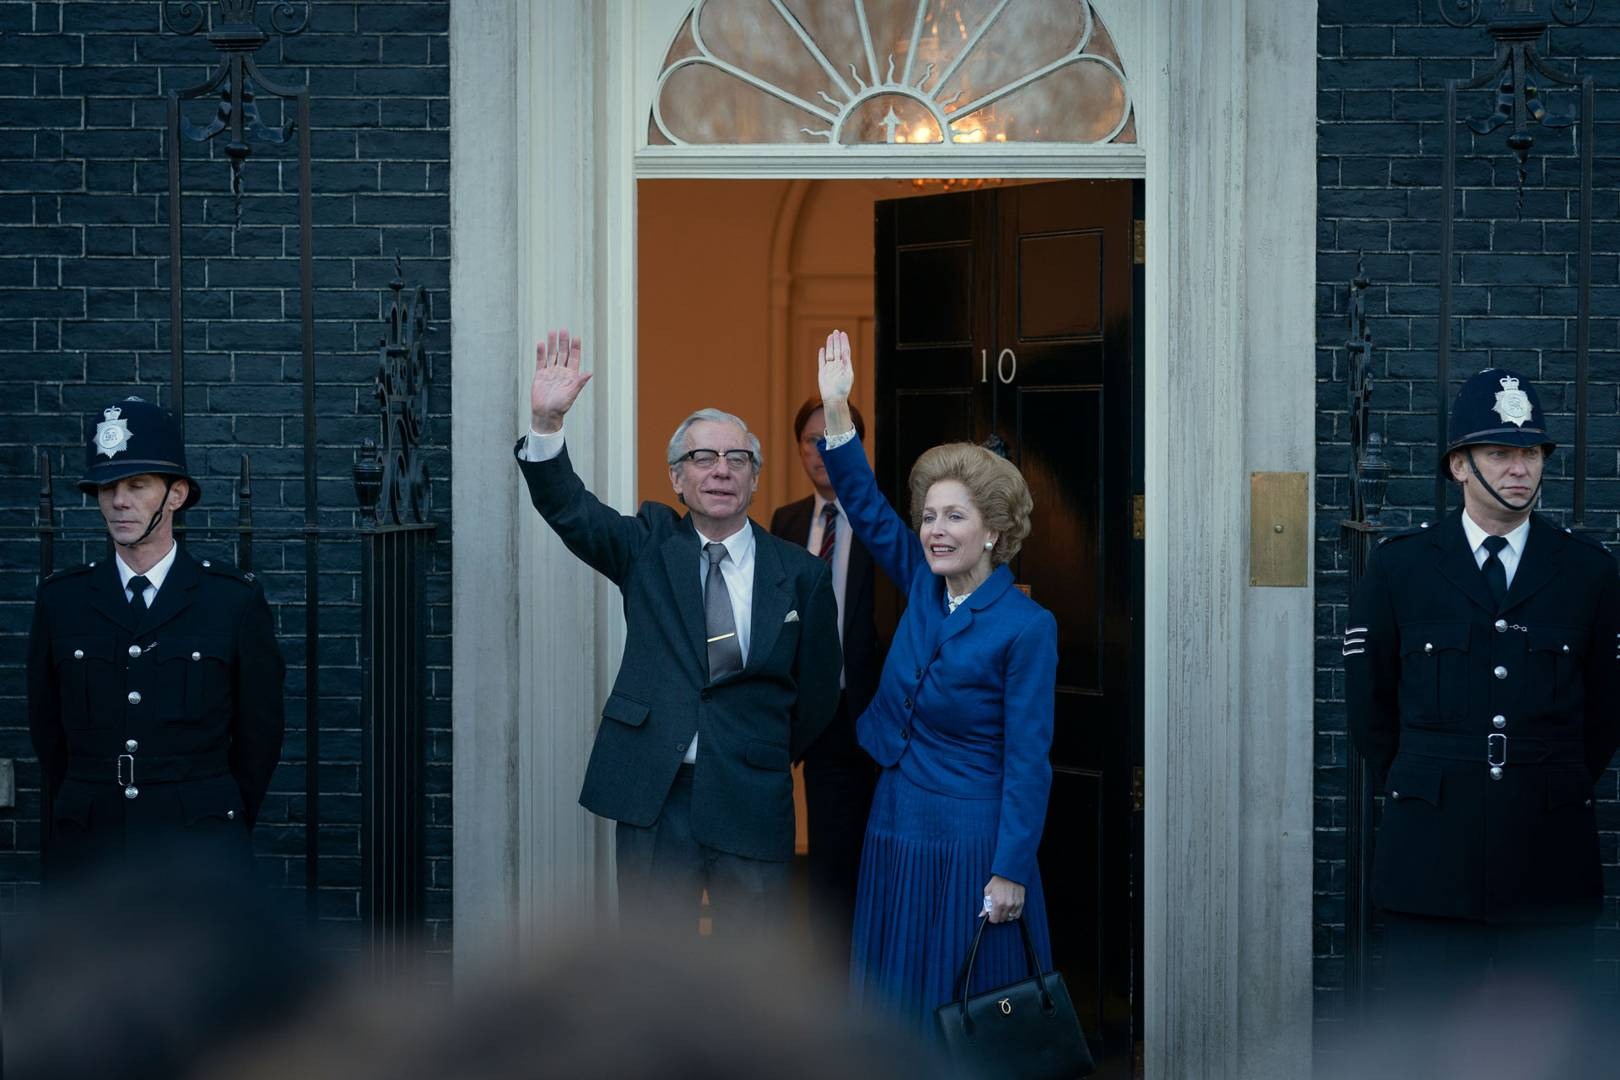 The Queen Margaret Thatcher S Relationship The Crown Season 4 Storyline Tatler